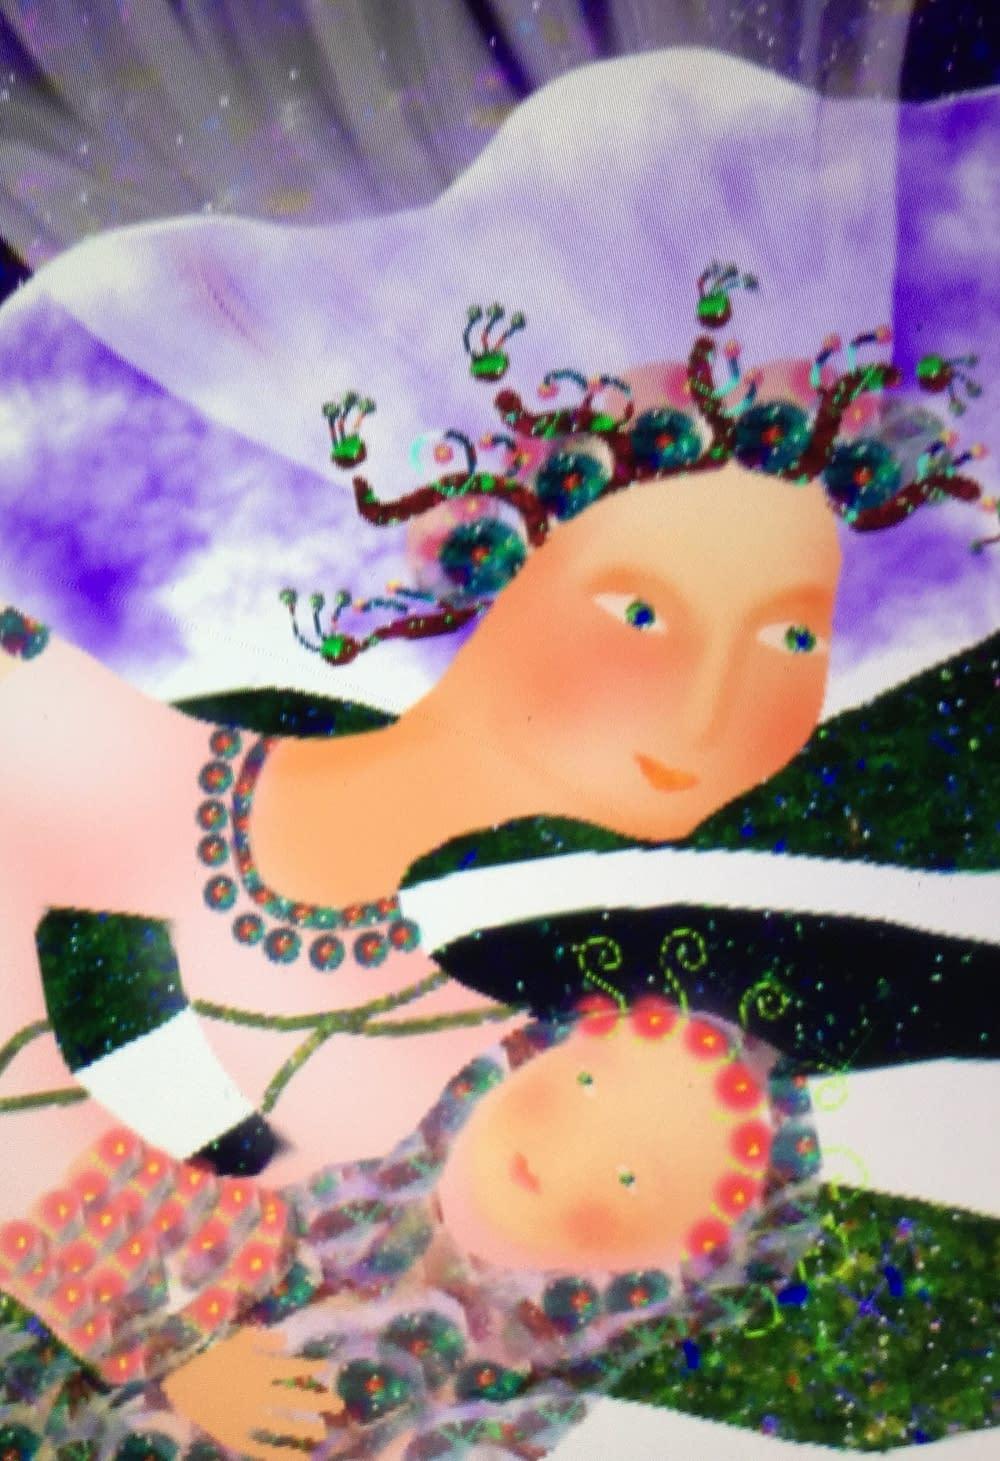 Lullaby from Greece, illustration Malin Skinnar